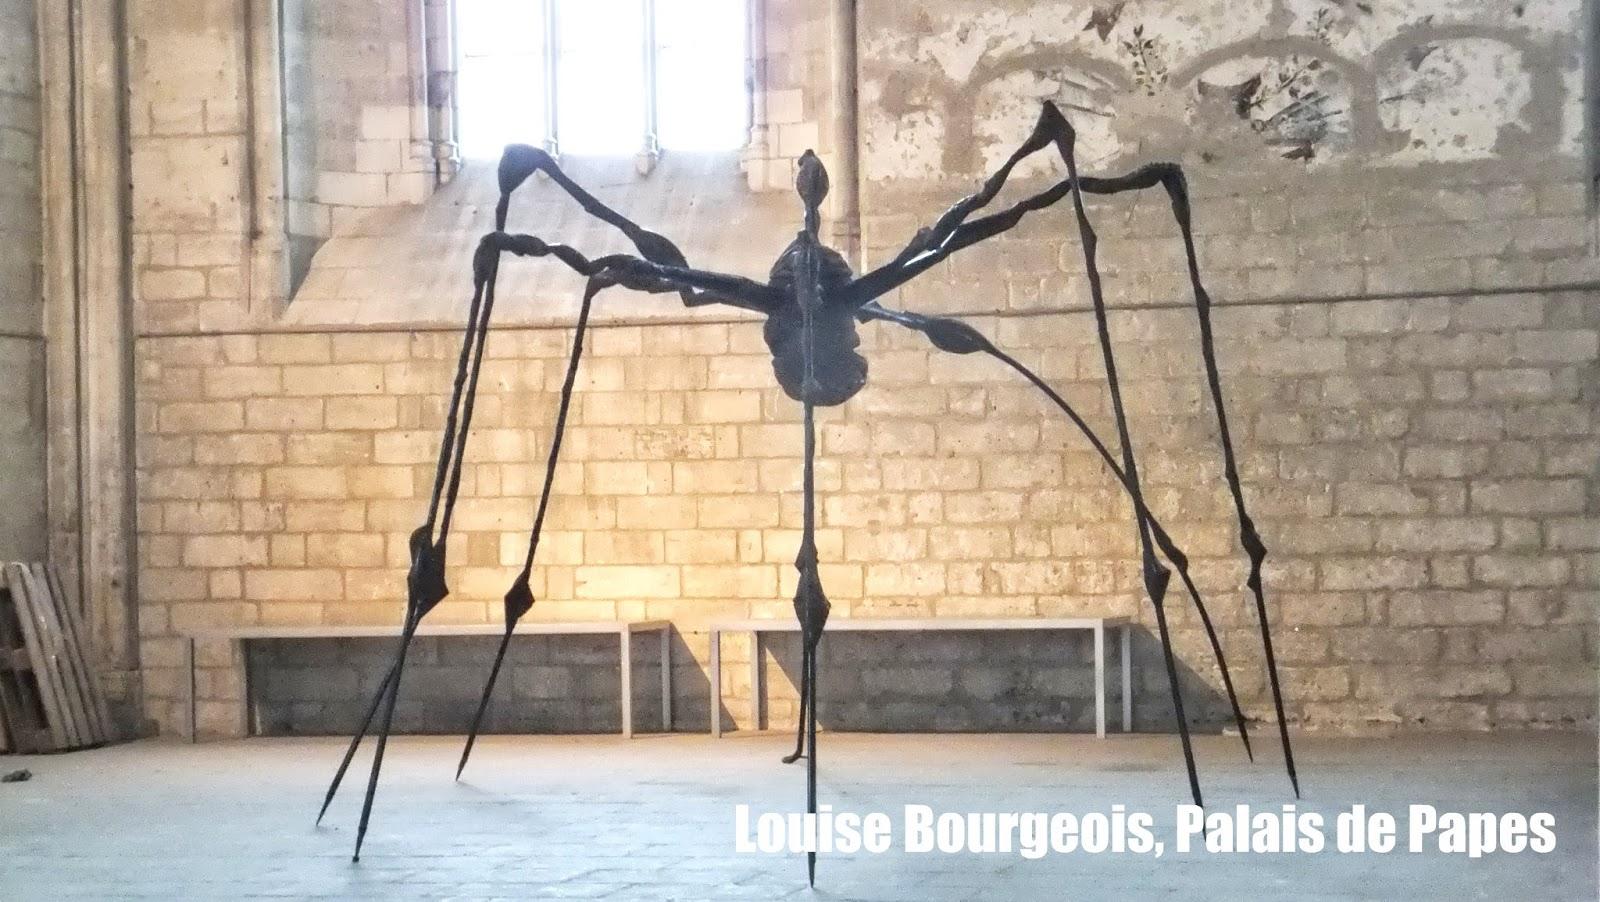 Papisas de Avignon, Louise Bourgeois